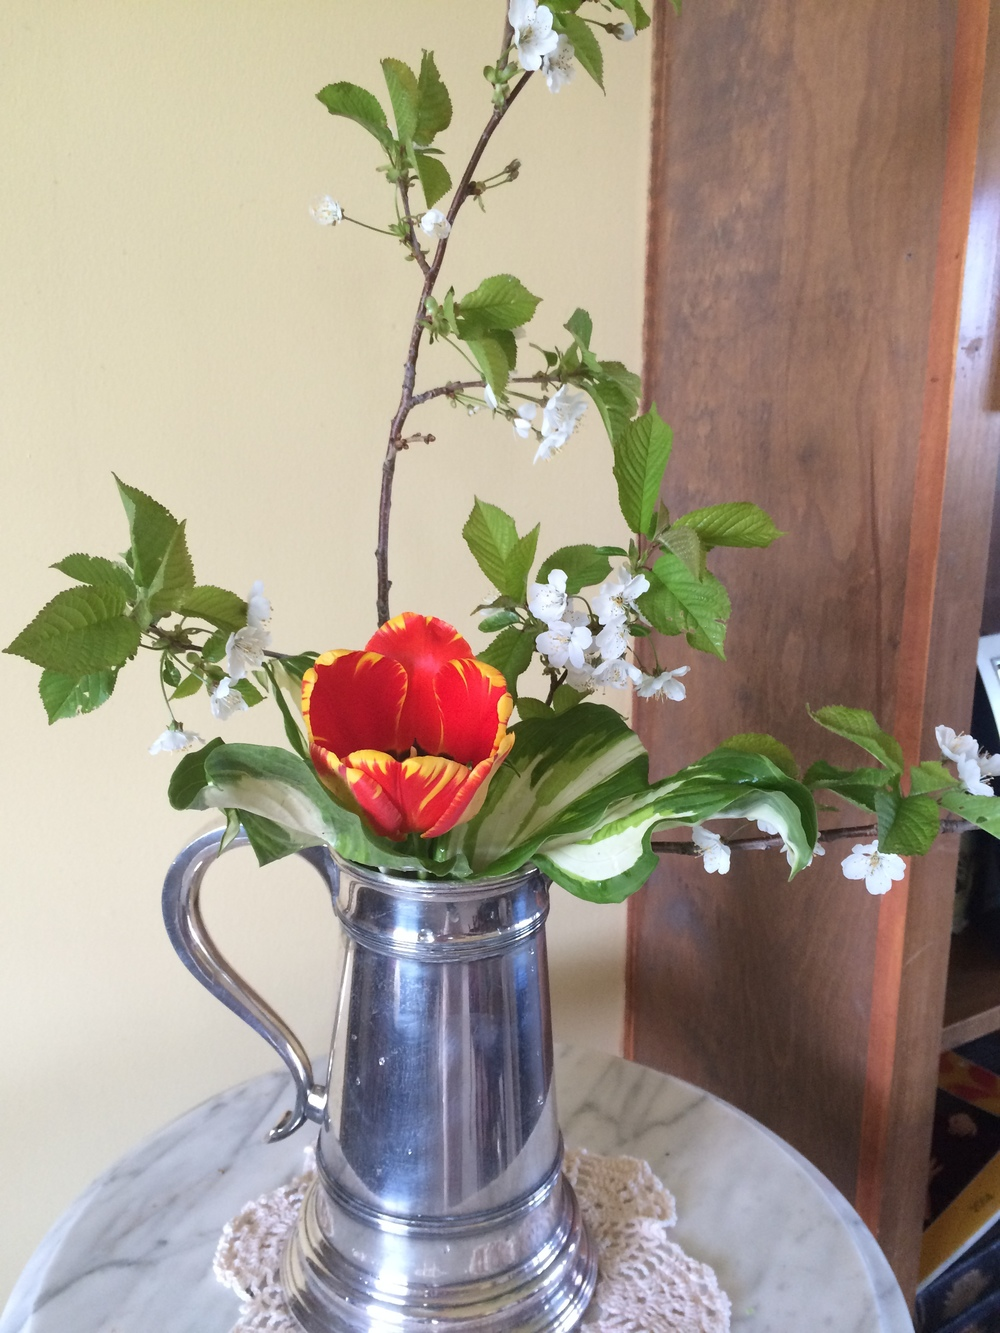 Cherry branch, tulip and hosta